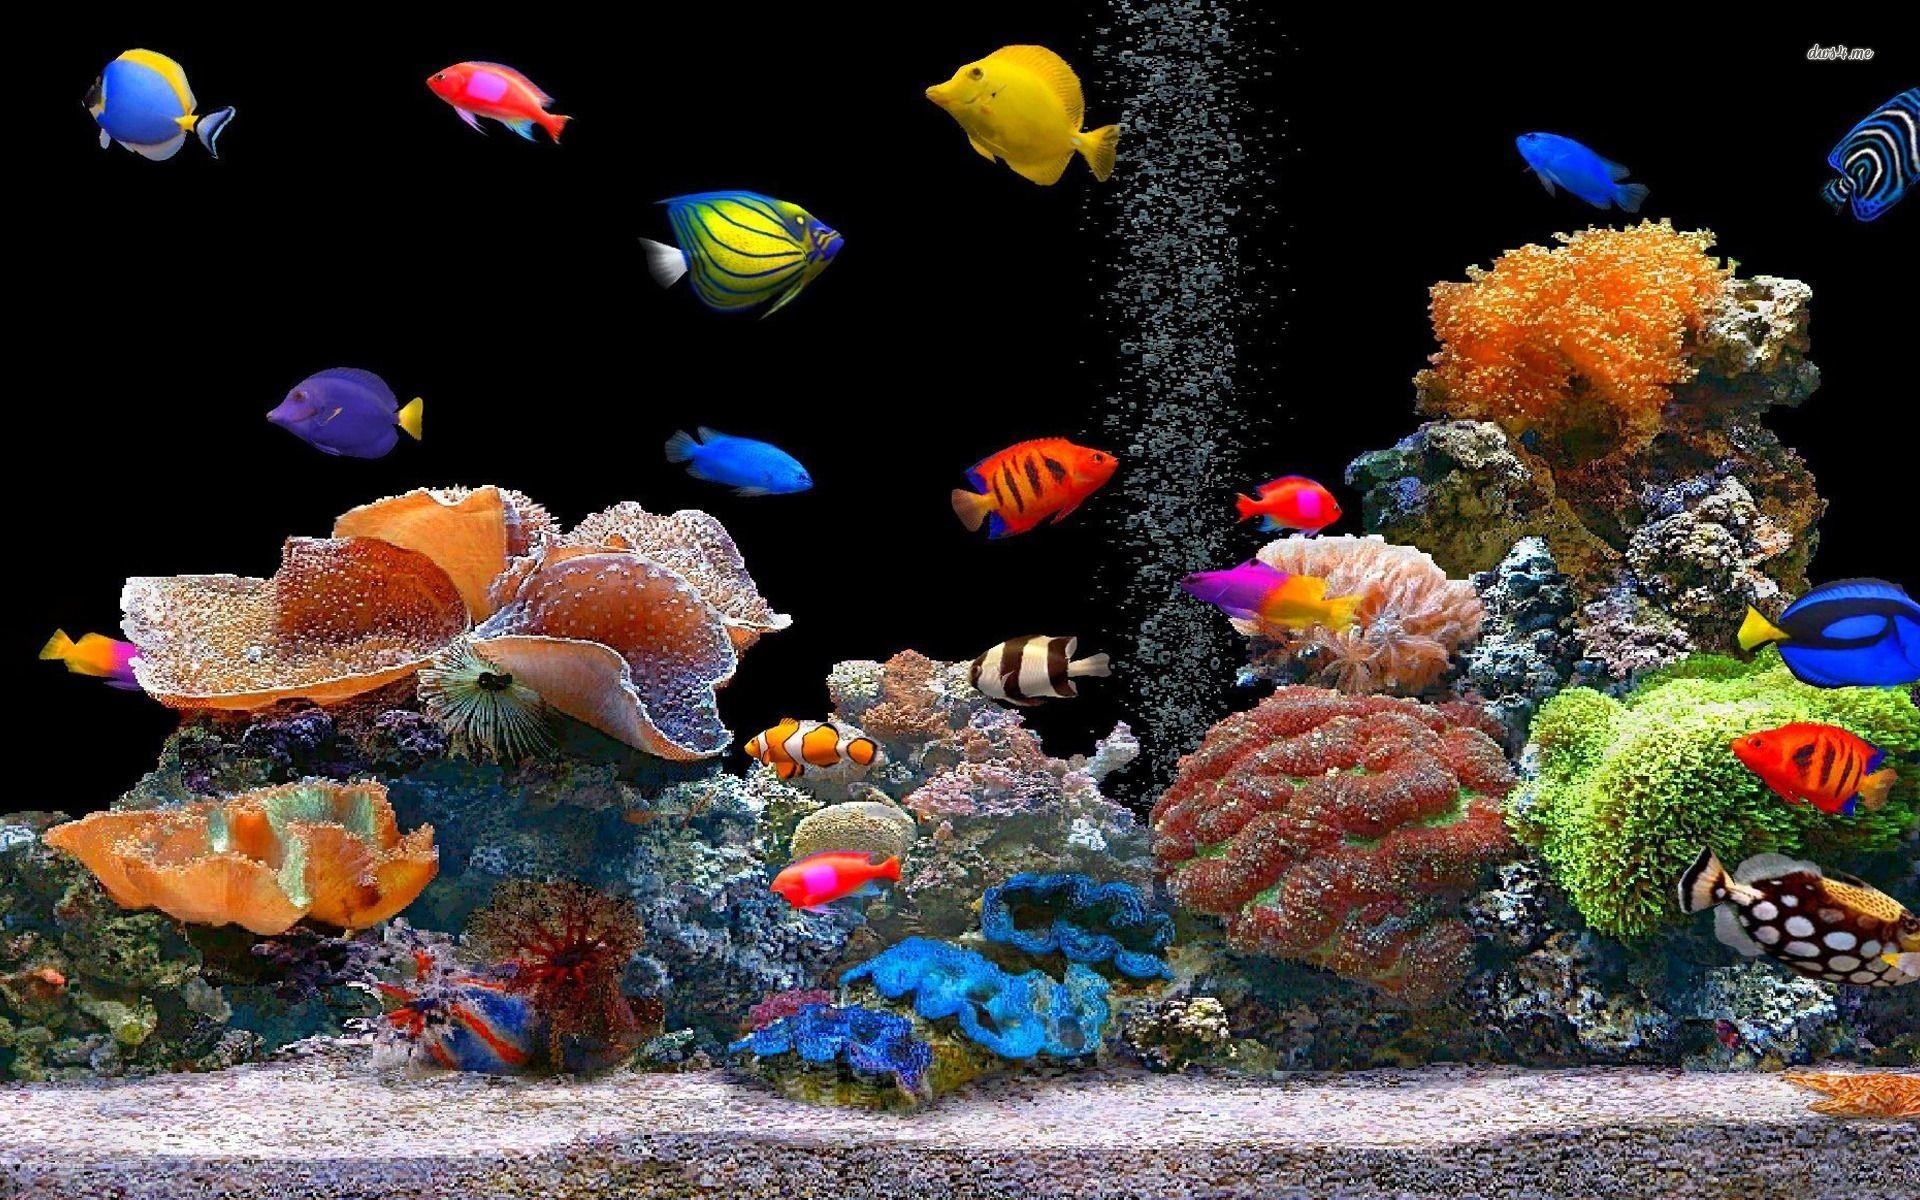 Tropical Fish School Desktop Animal 1920 X 1080 Oscar Fish Desktop .